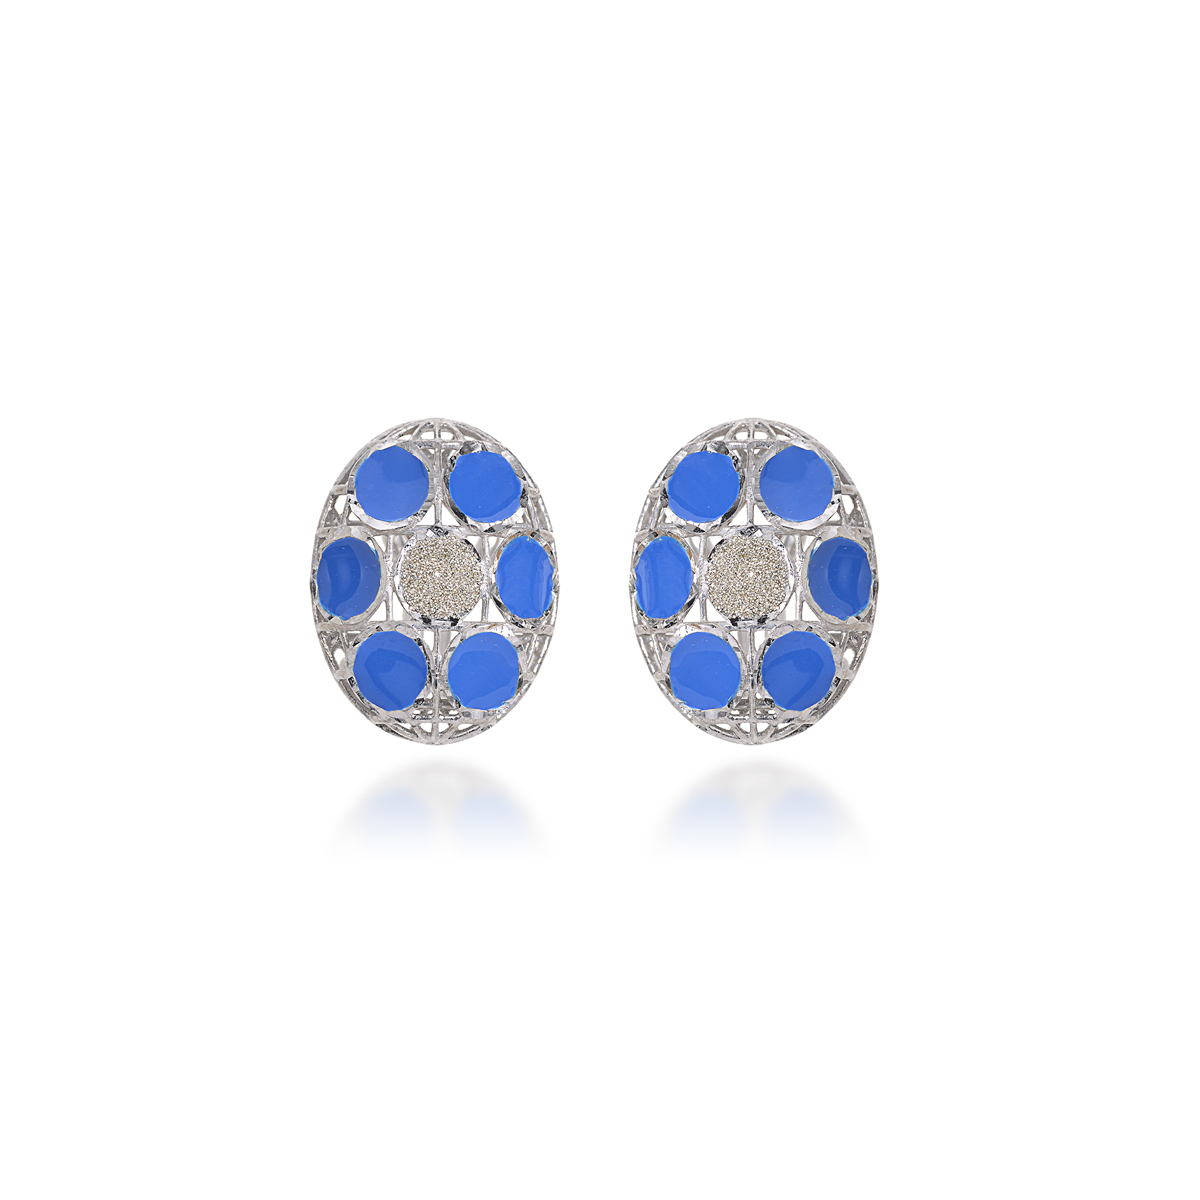 Rhodium Silver Earrings